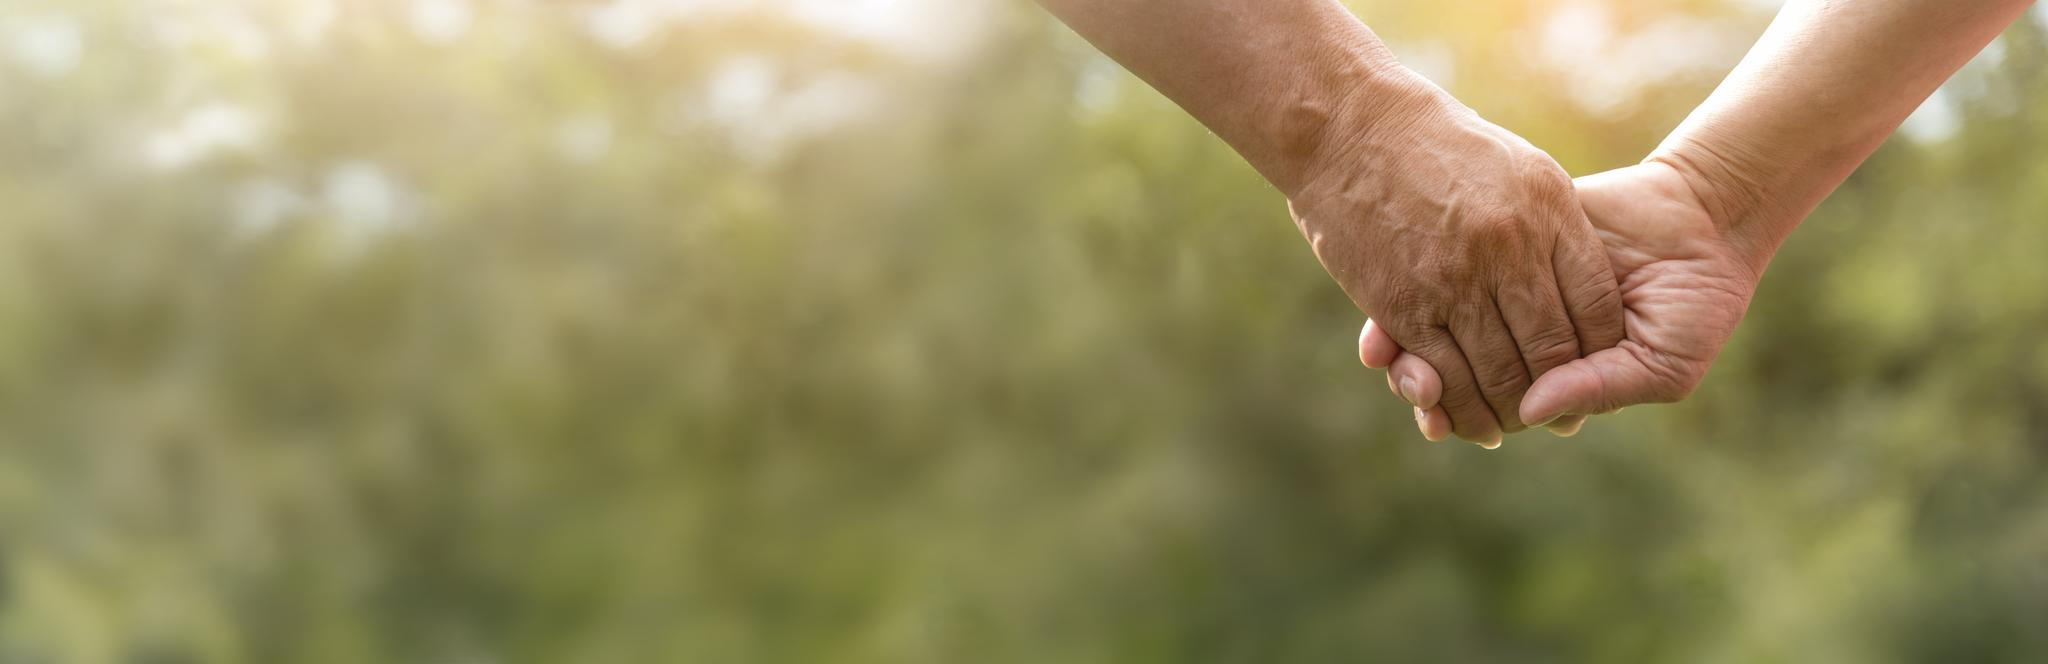 Ausschnitt: Zwei Senioren halten sich an den Händen